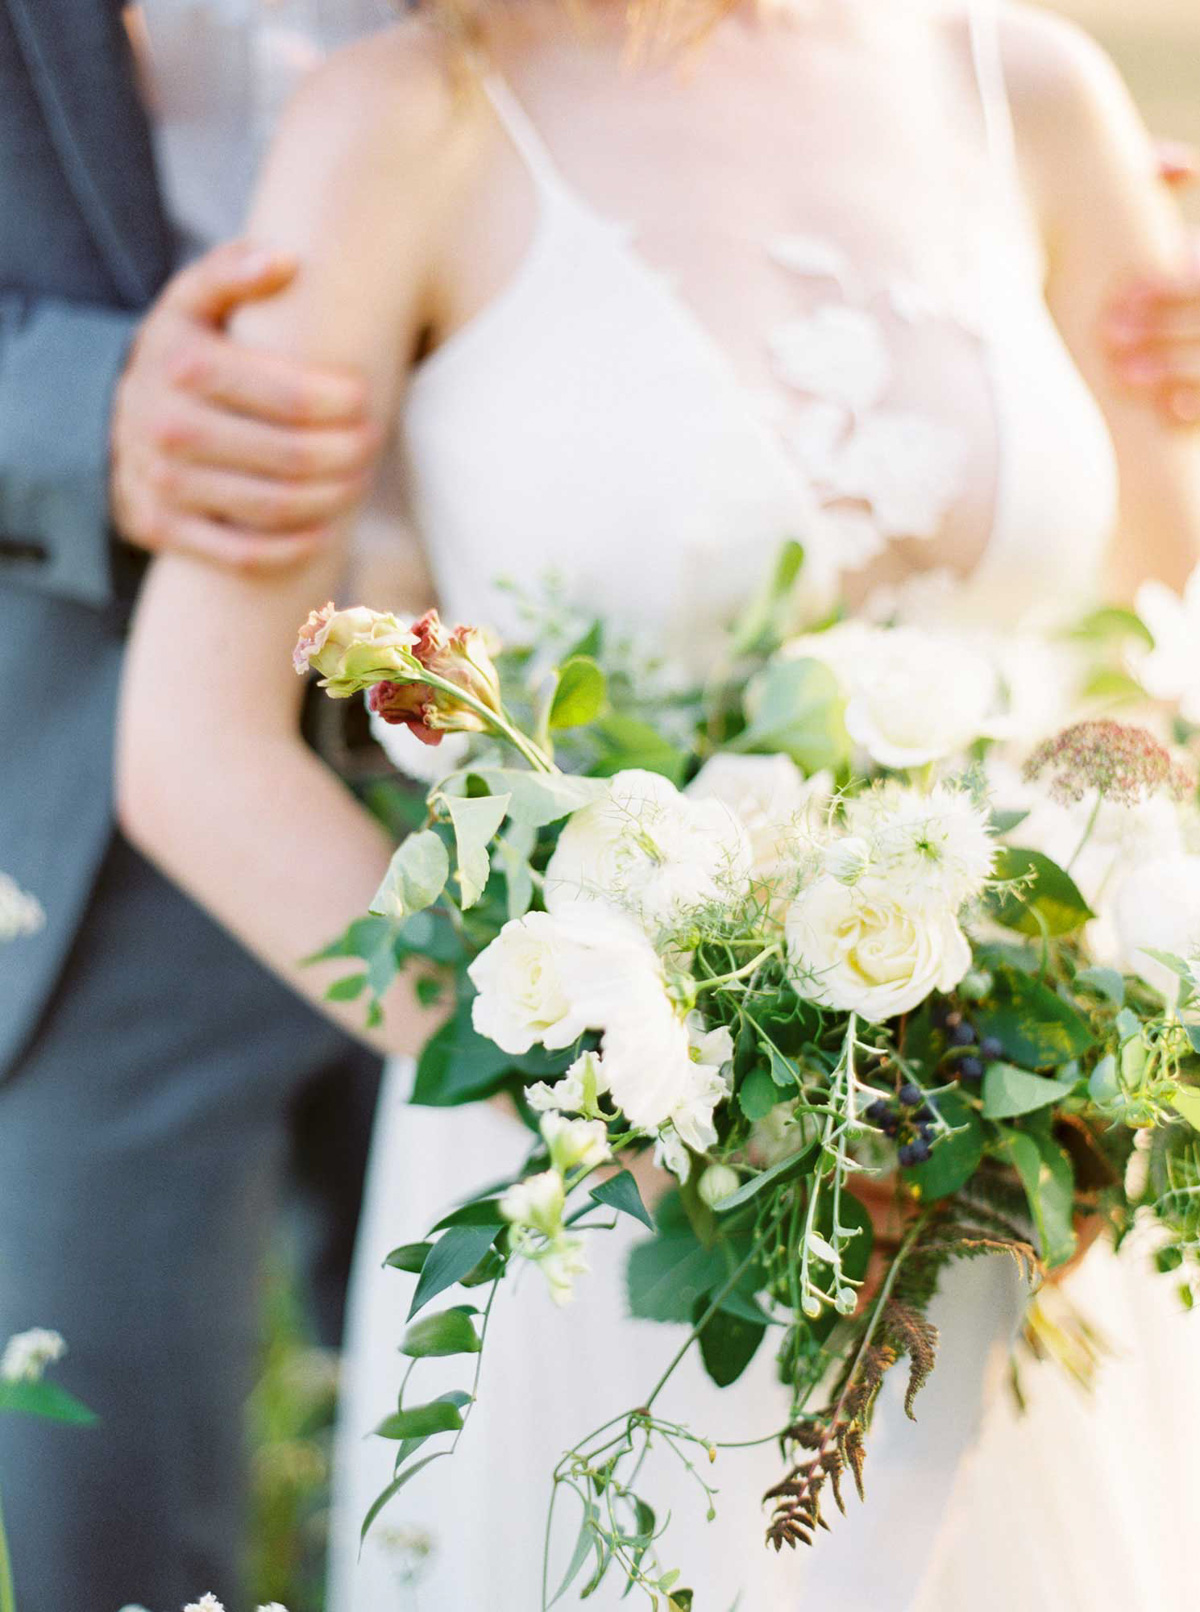 kayla-yestal-vineyard-bride-swish-list-woodland-weddings-niagara-wedding-editorial-48.jpg